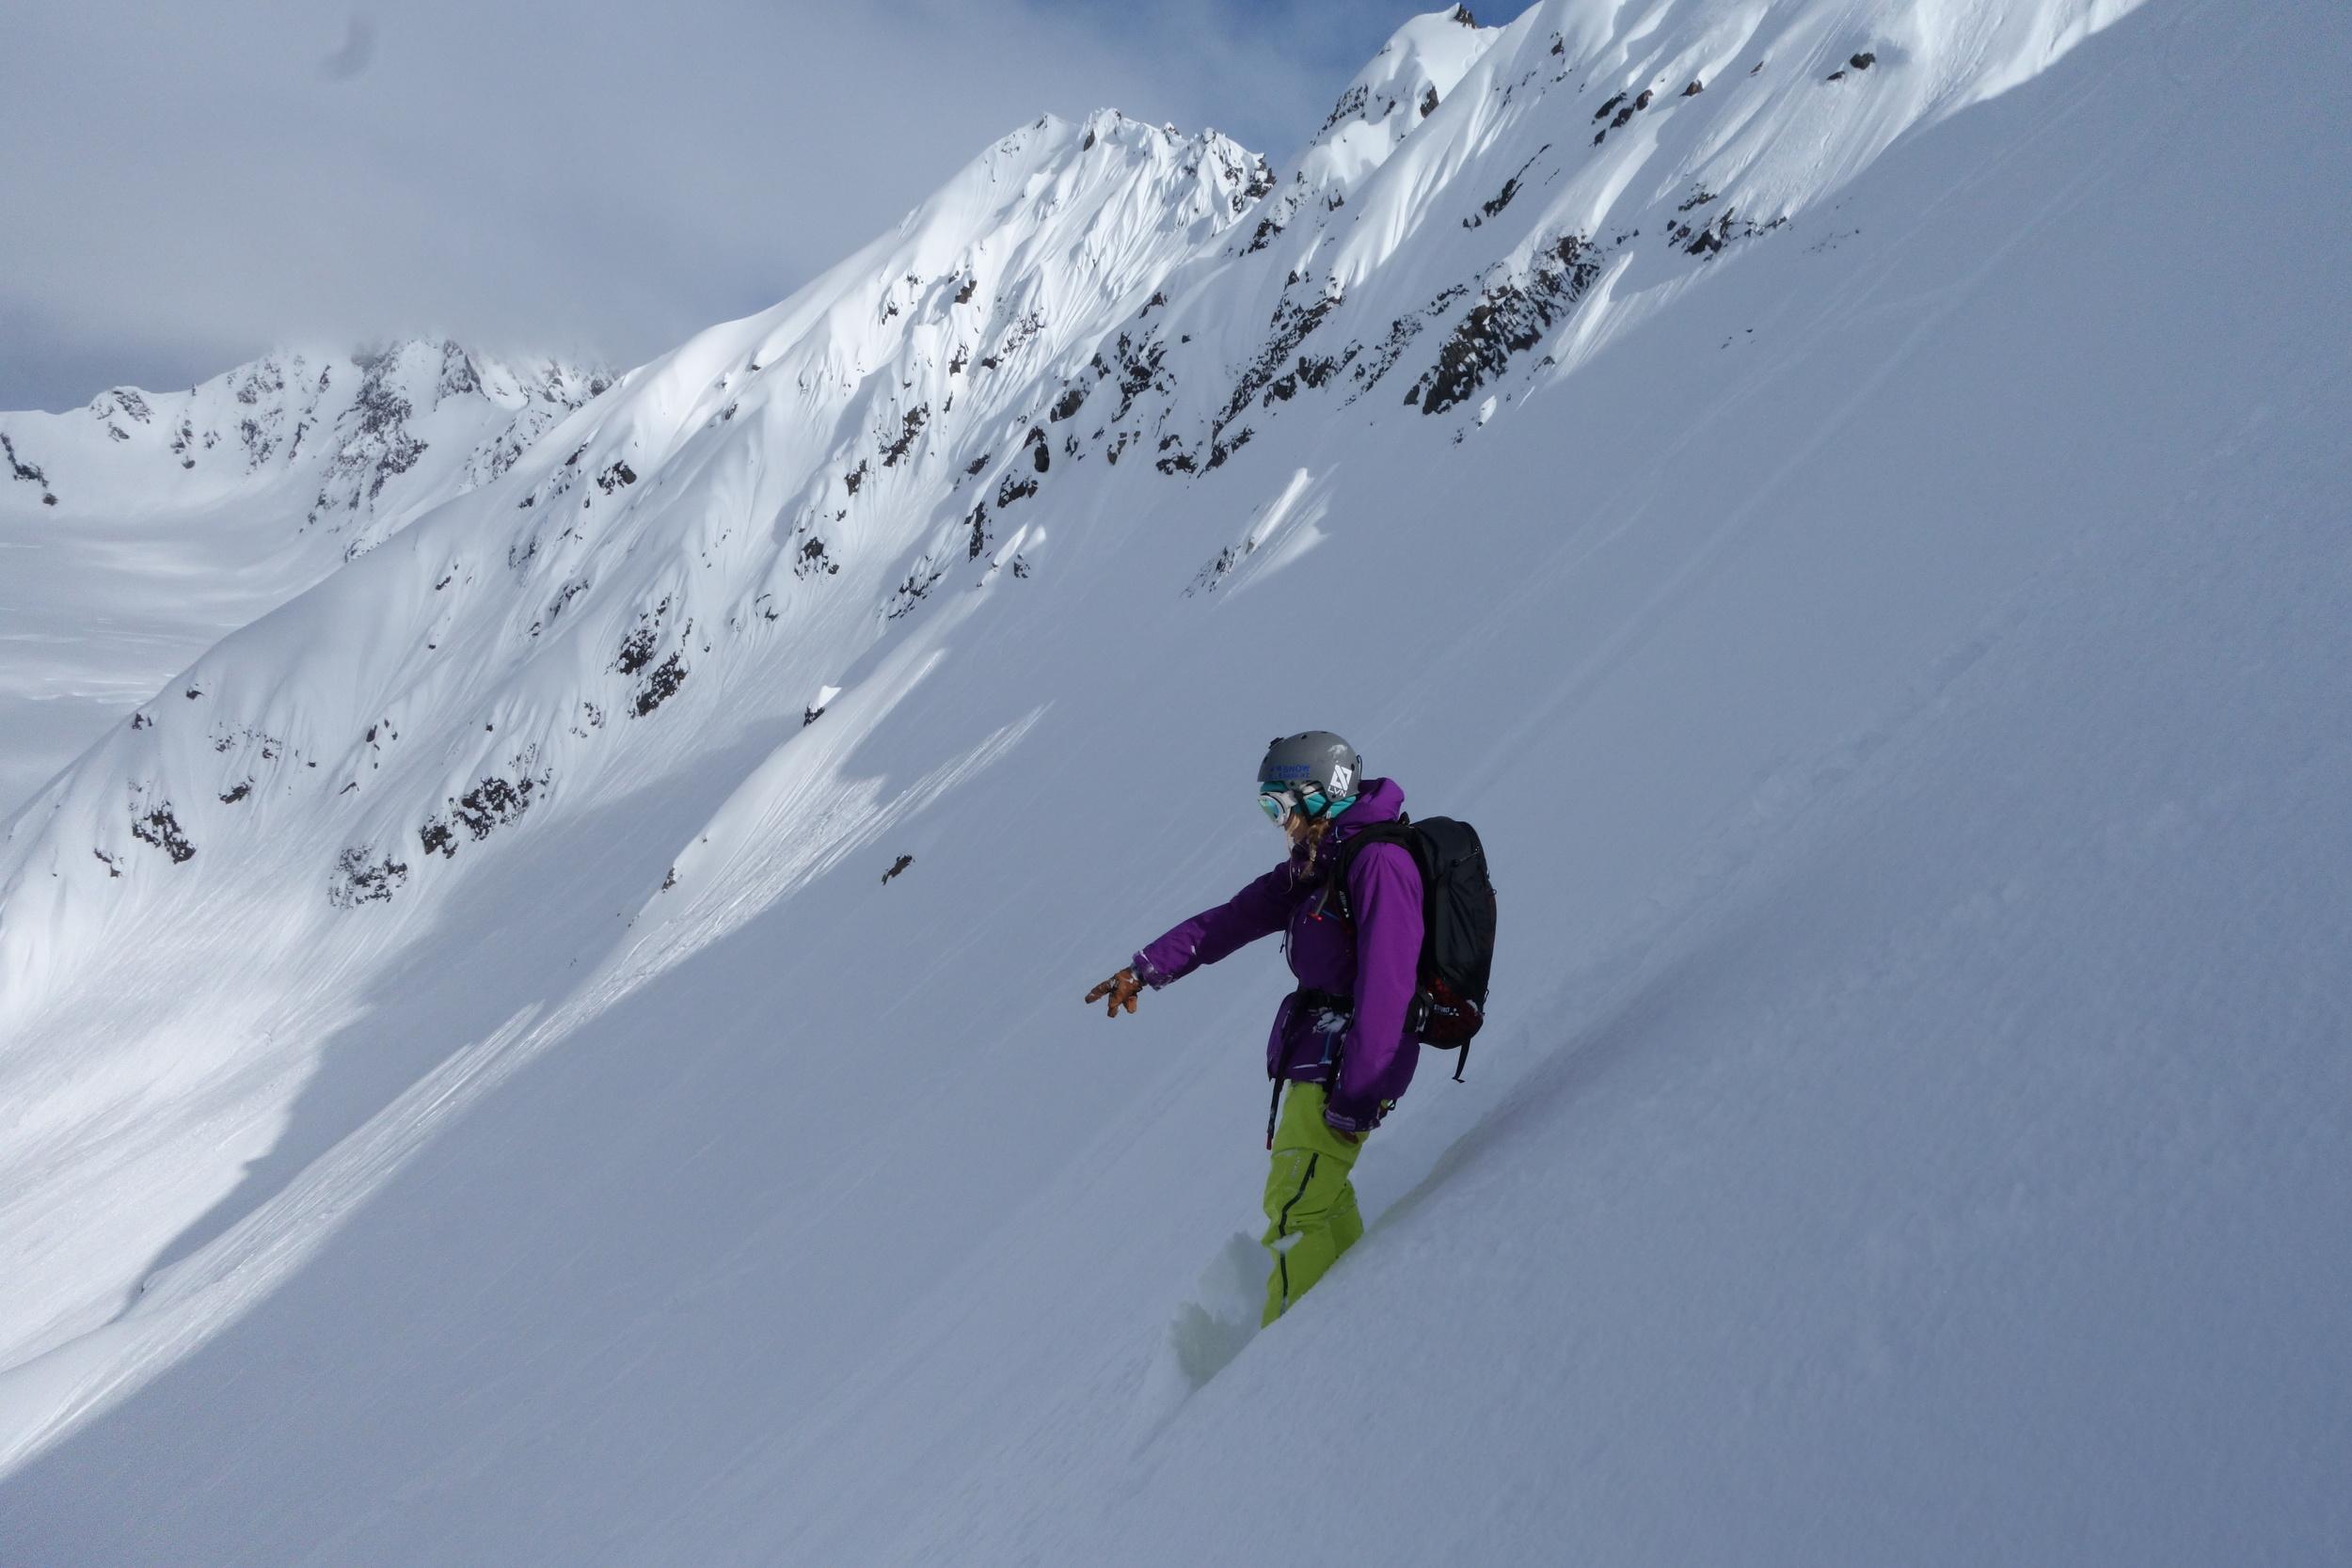 Pure Snow Snowboarding Alaska Alexa 8.JPG